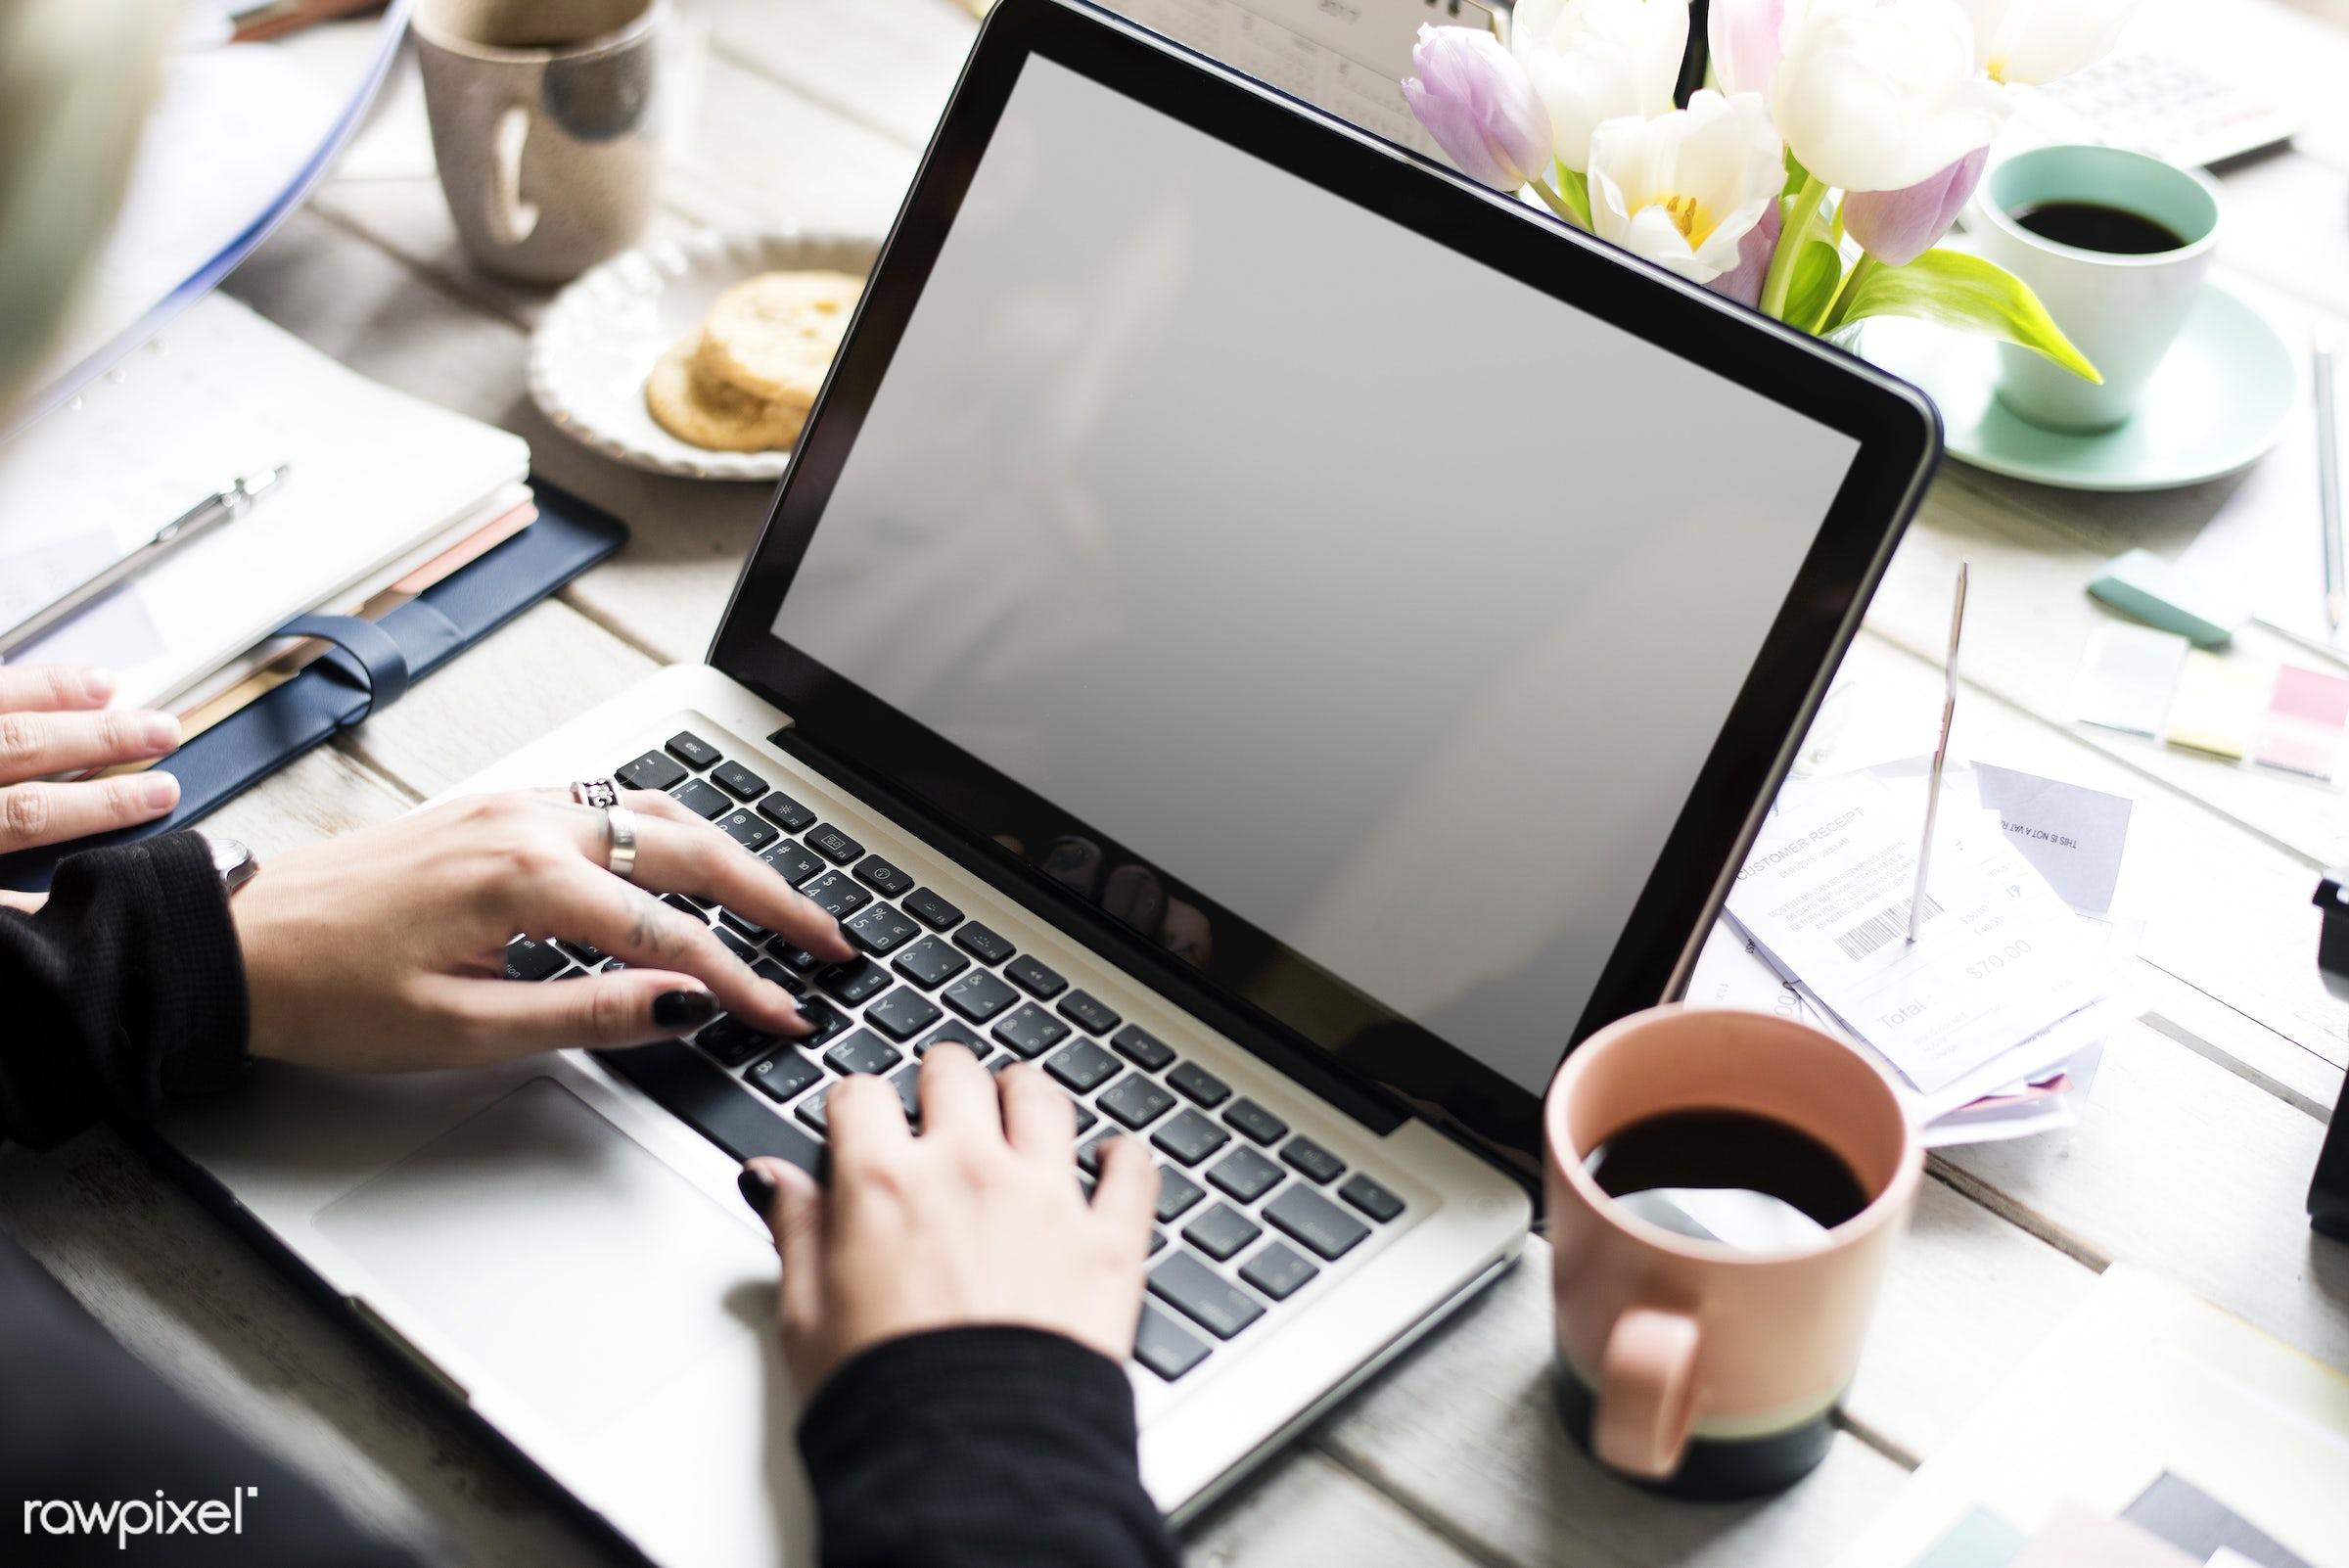 copy space, technology, workspace, mockup, workplace, leaf, desk, beauty, blossom, nature, fresh, laptop, refresh, flower,...